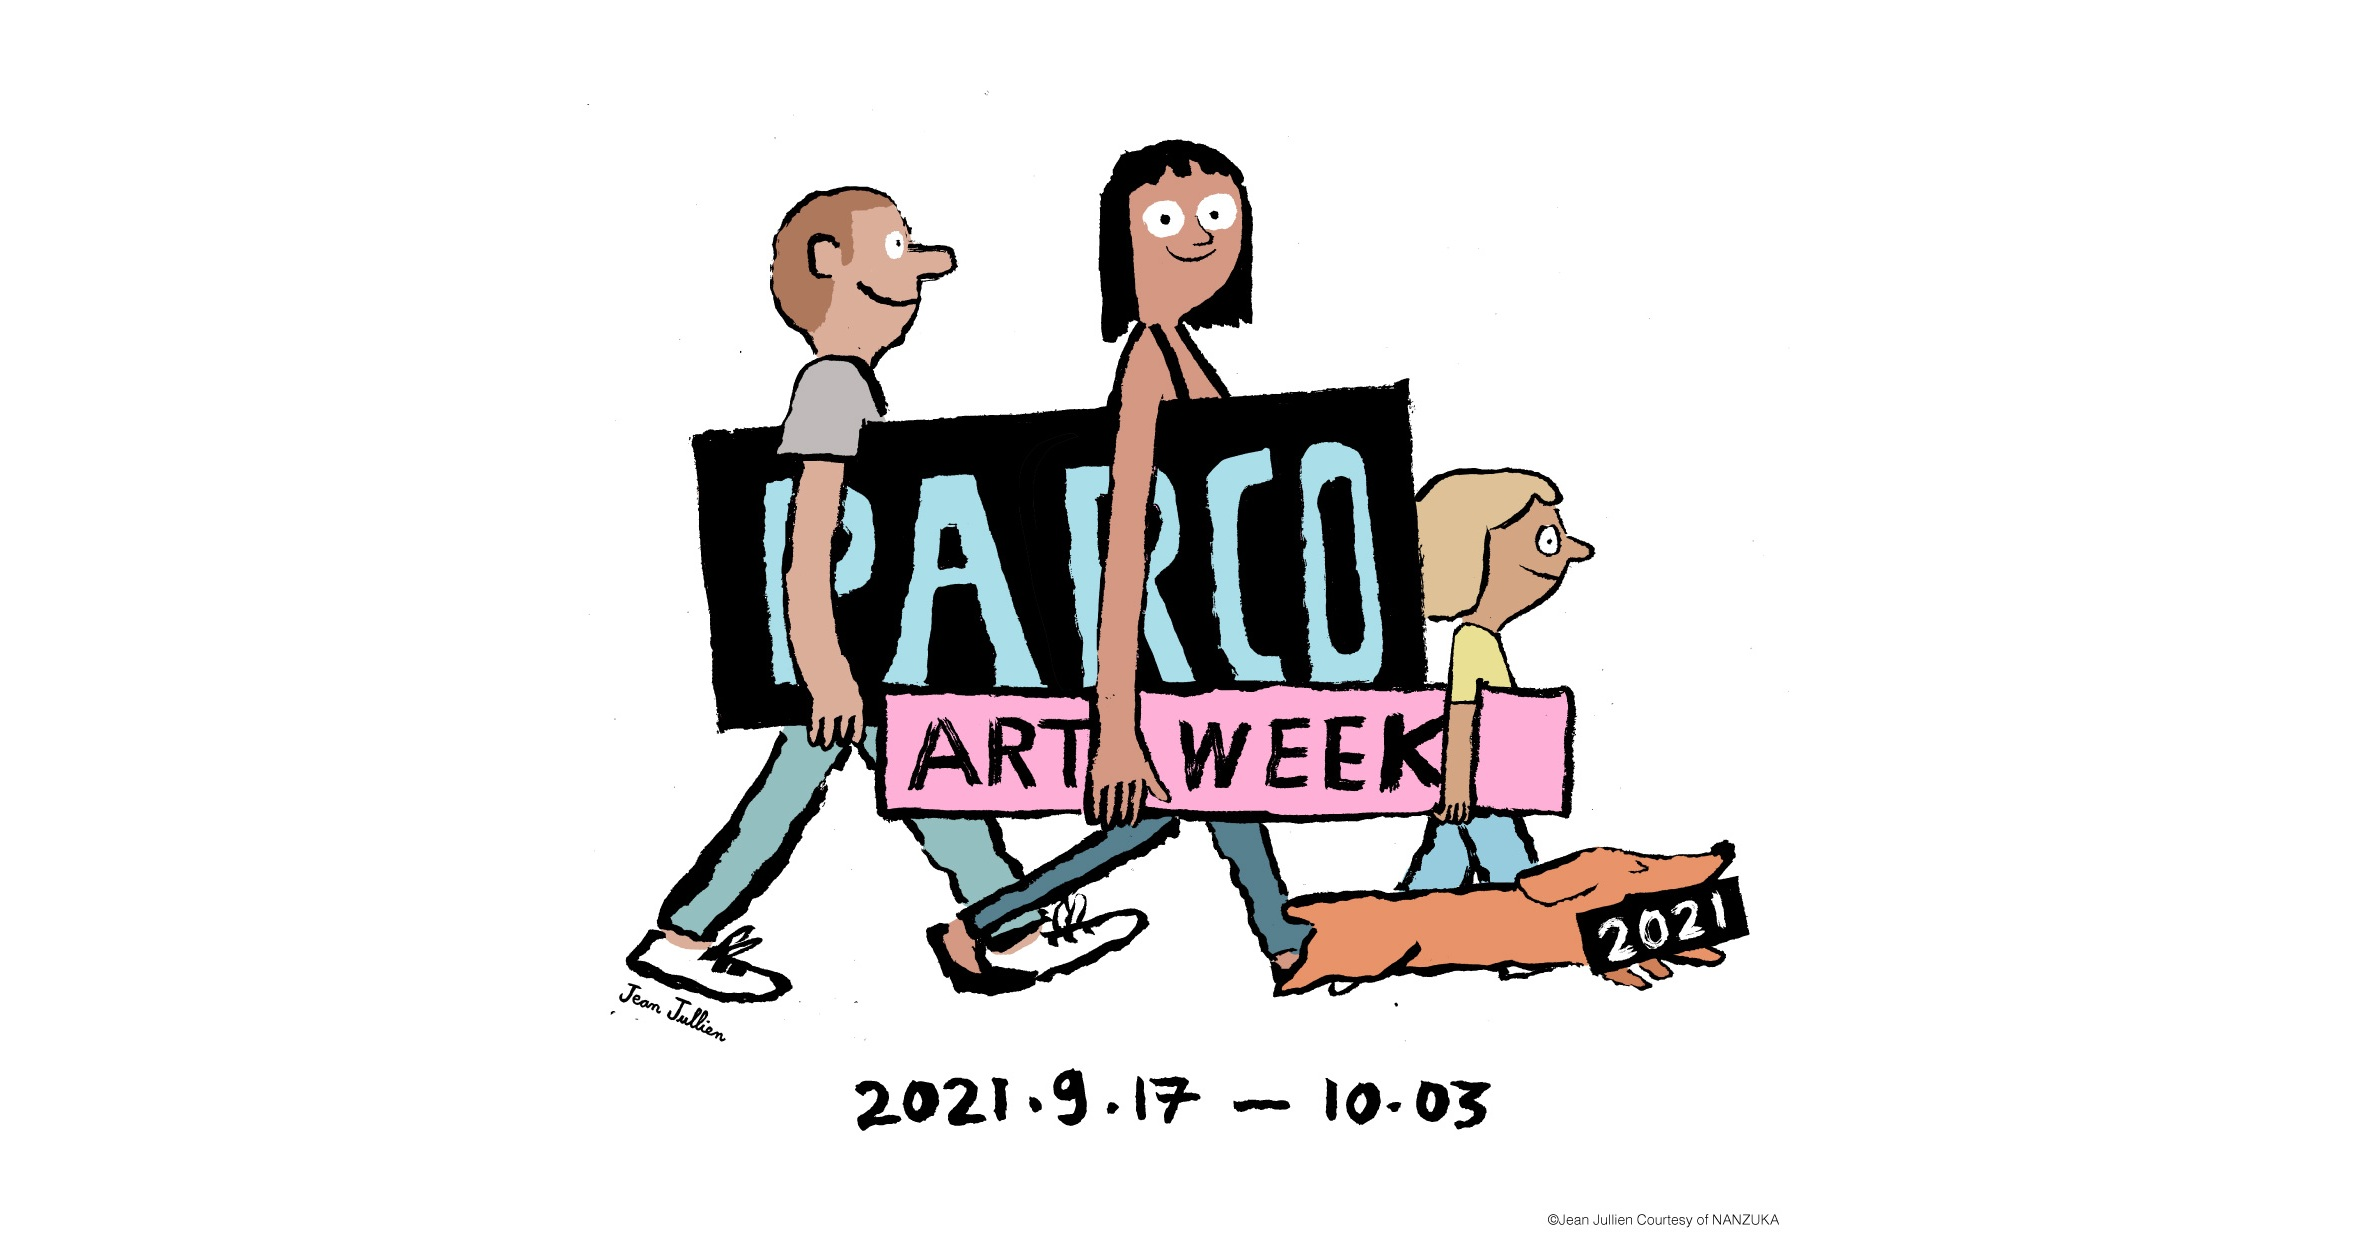 SHIBUYA PARCO ART WEEK 20211